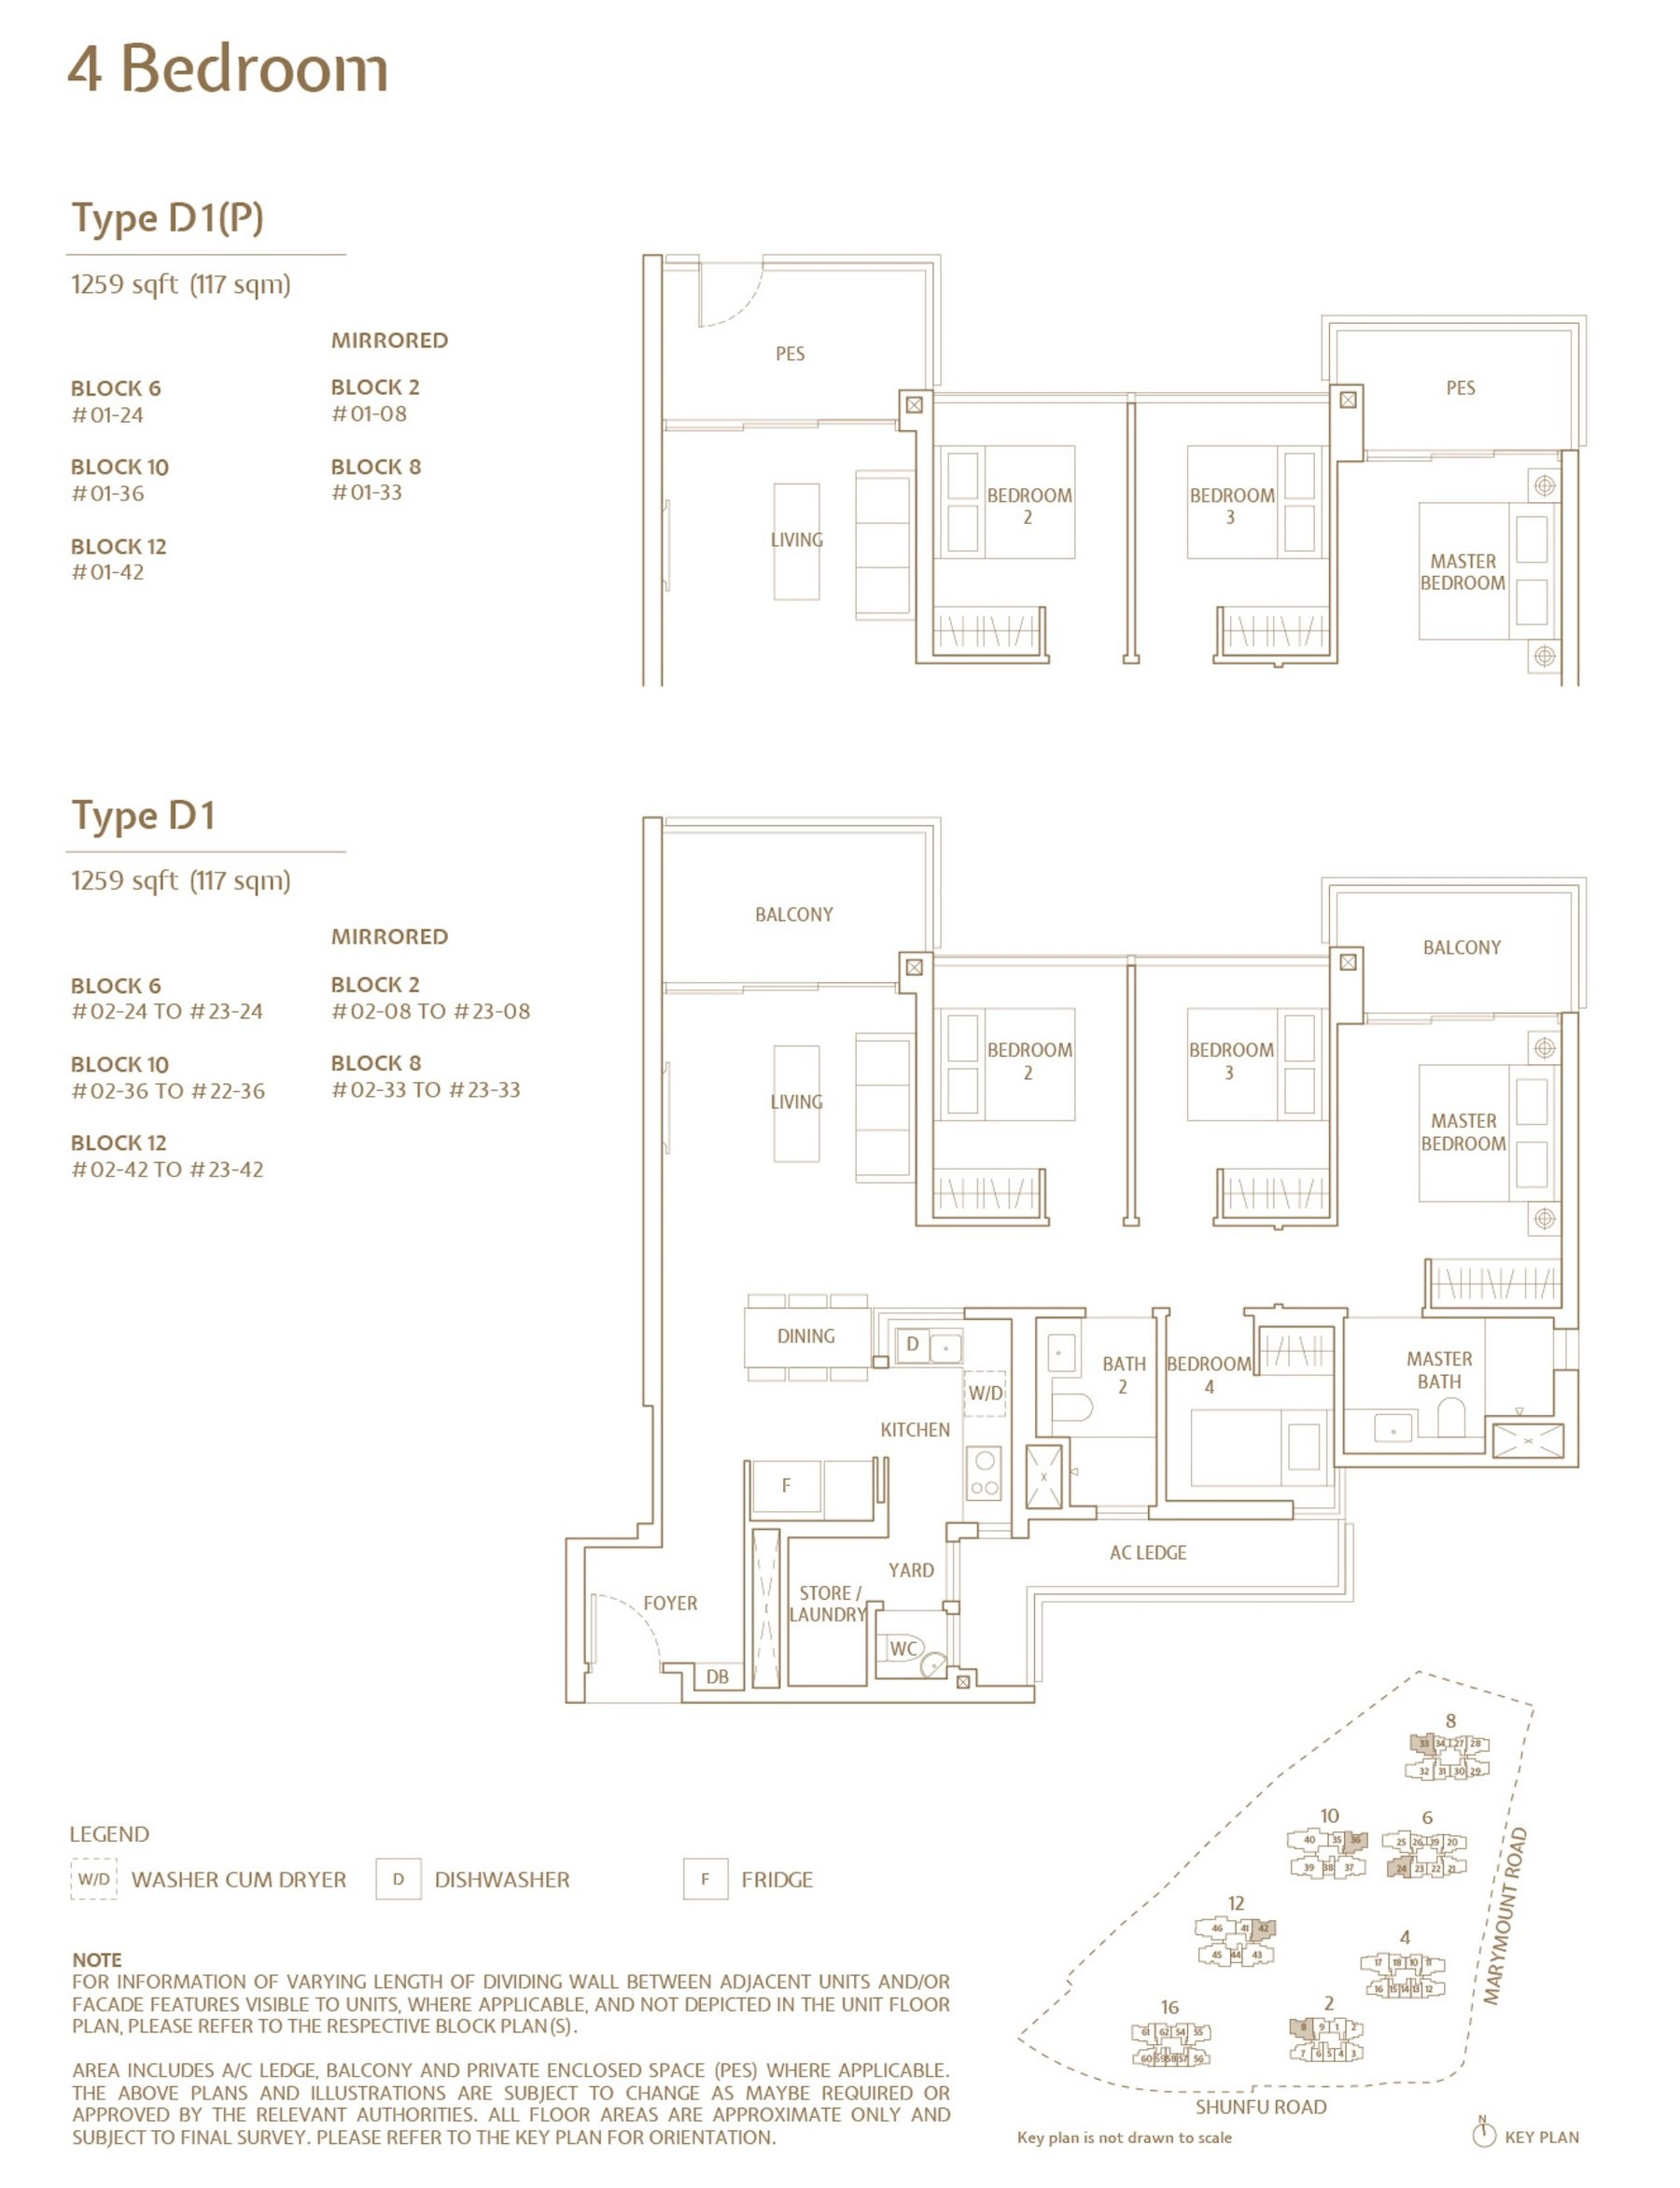 Jadescape 顺福轩 condo 4 bedroom type D1